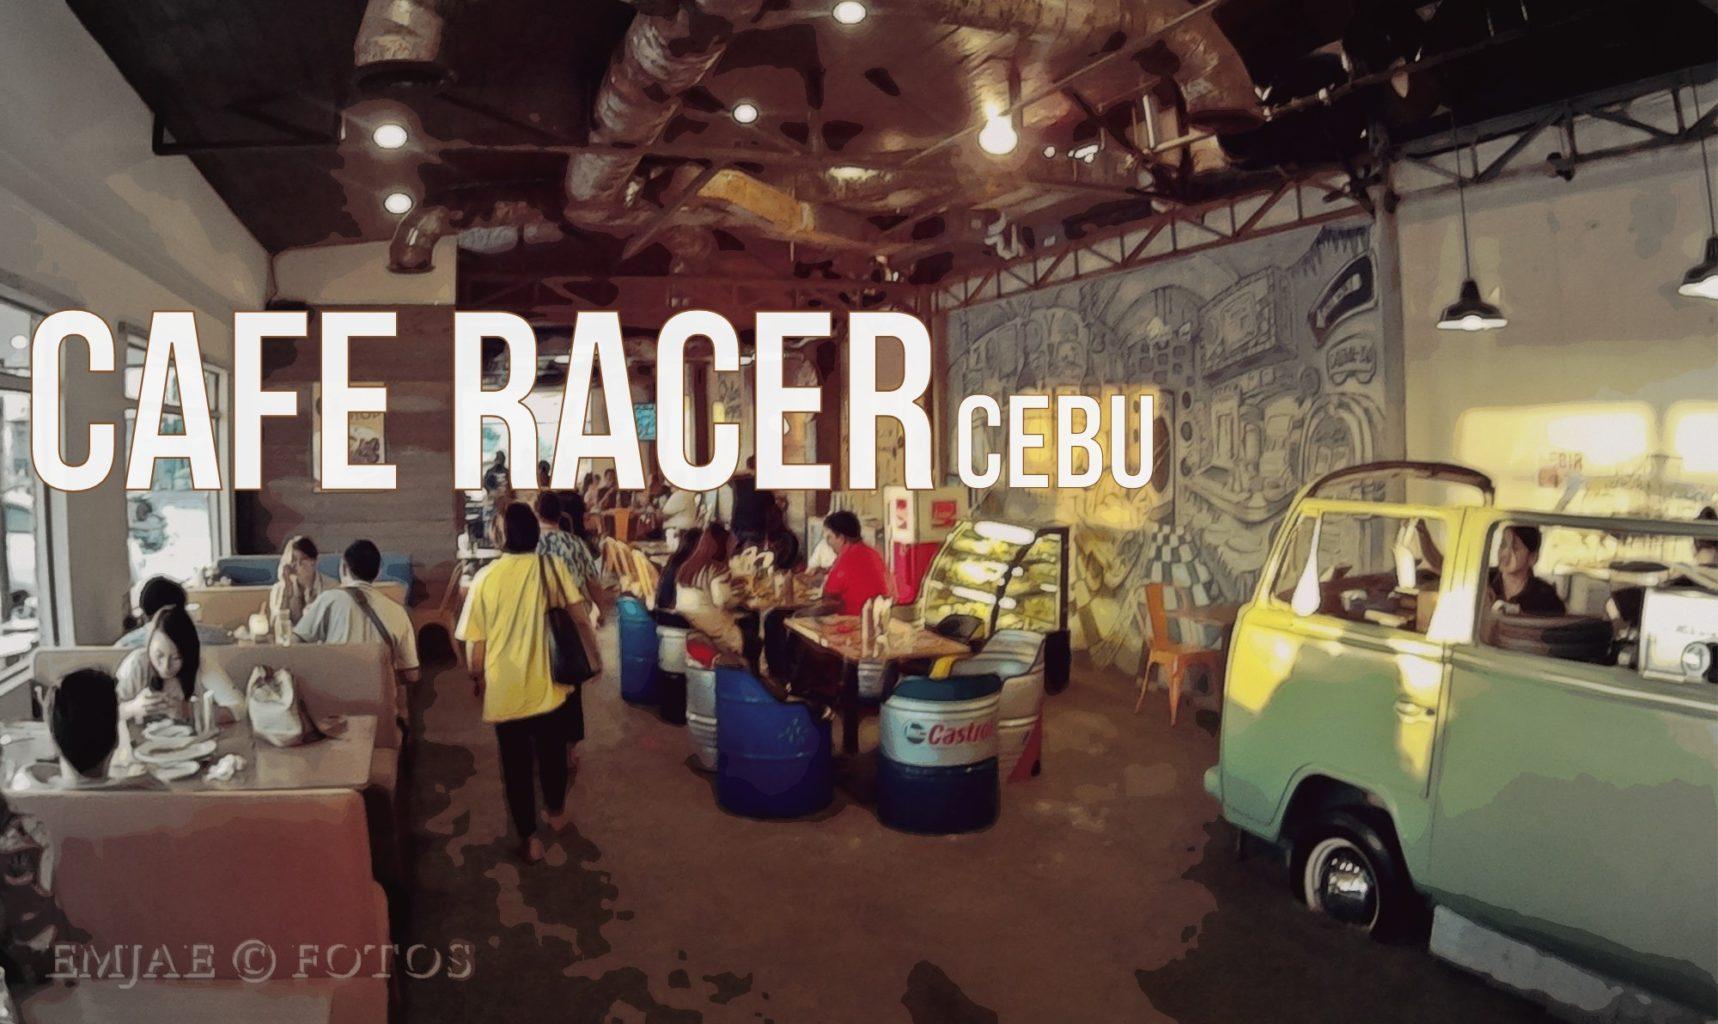 Cafe Racer Cebu: Where Dining Meets Vintage